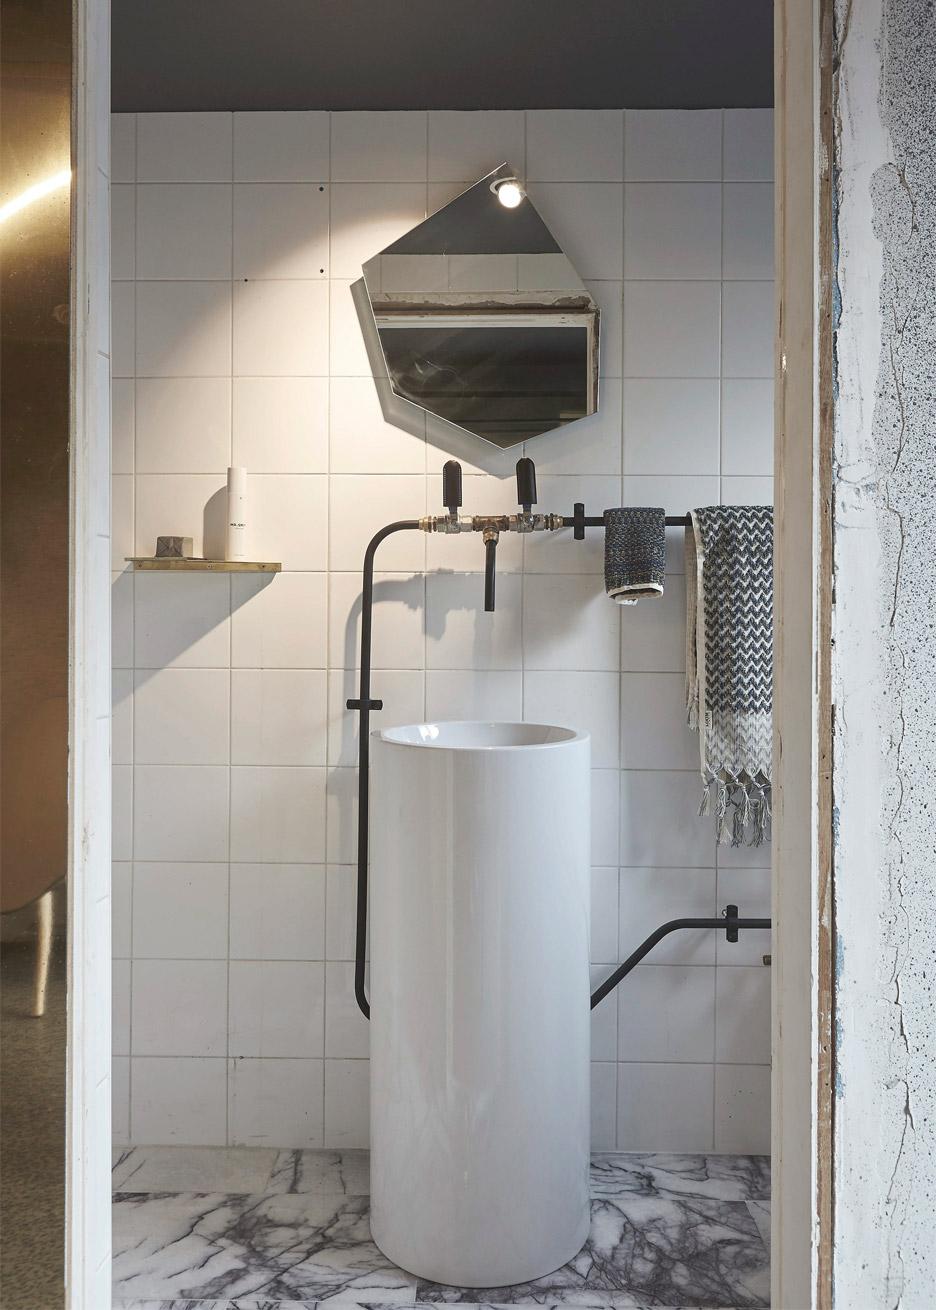 microlux-melbourne-australia-apartment-interior-design-edwards-moore_dezeen_936_7.jpg